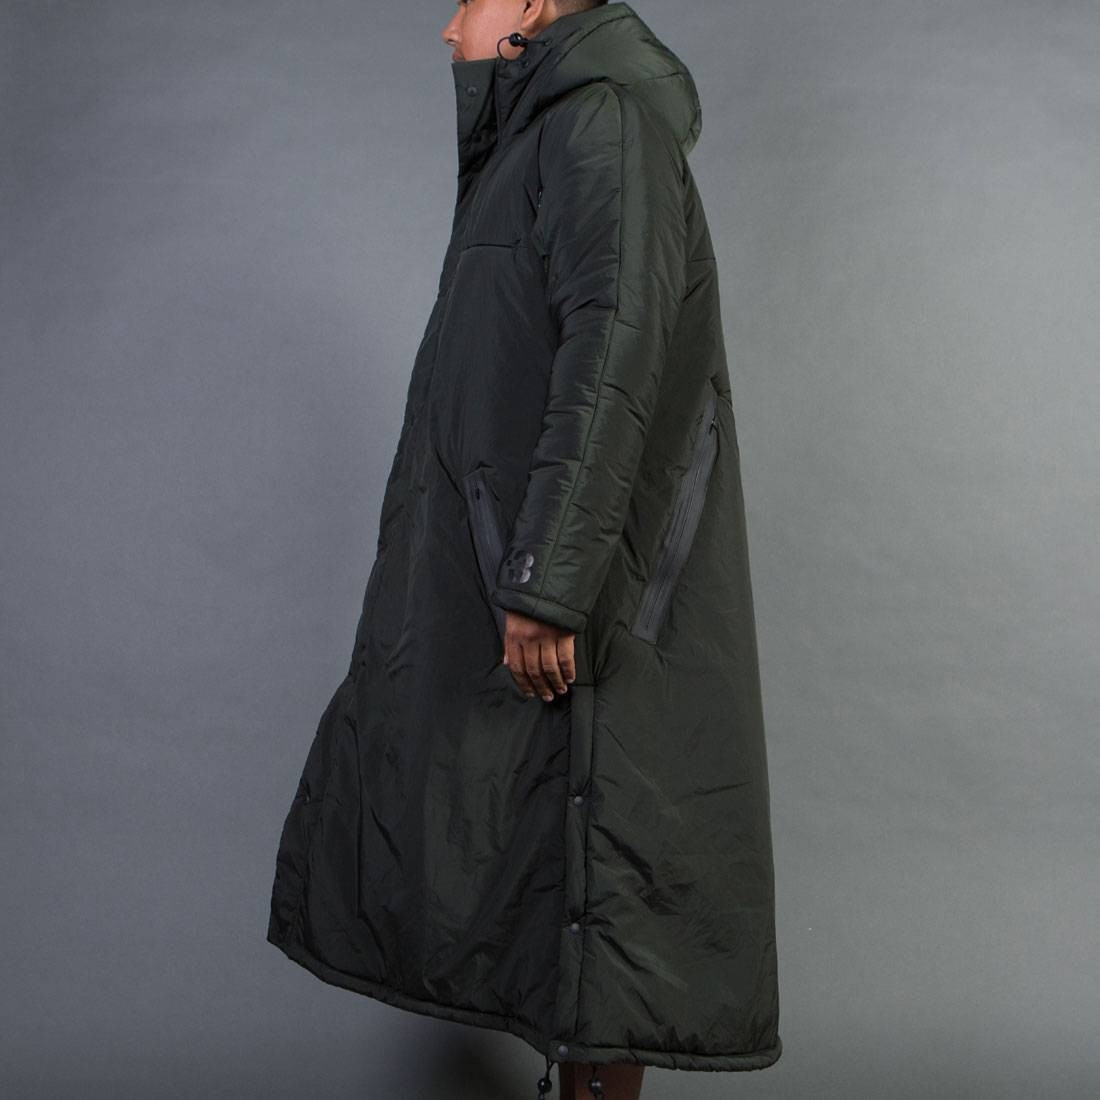 dce27656b Adidas Y-3 Men Nylon PA Coat (olive / dark black olive)